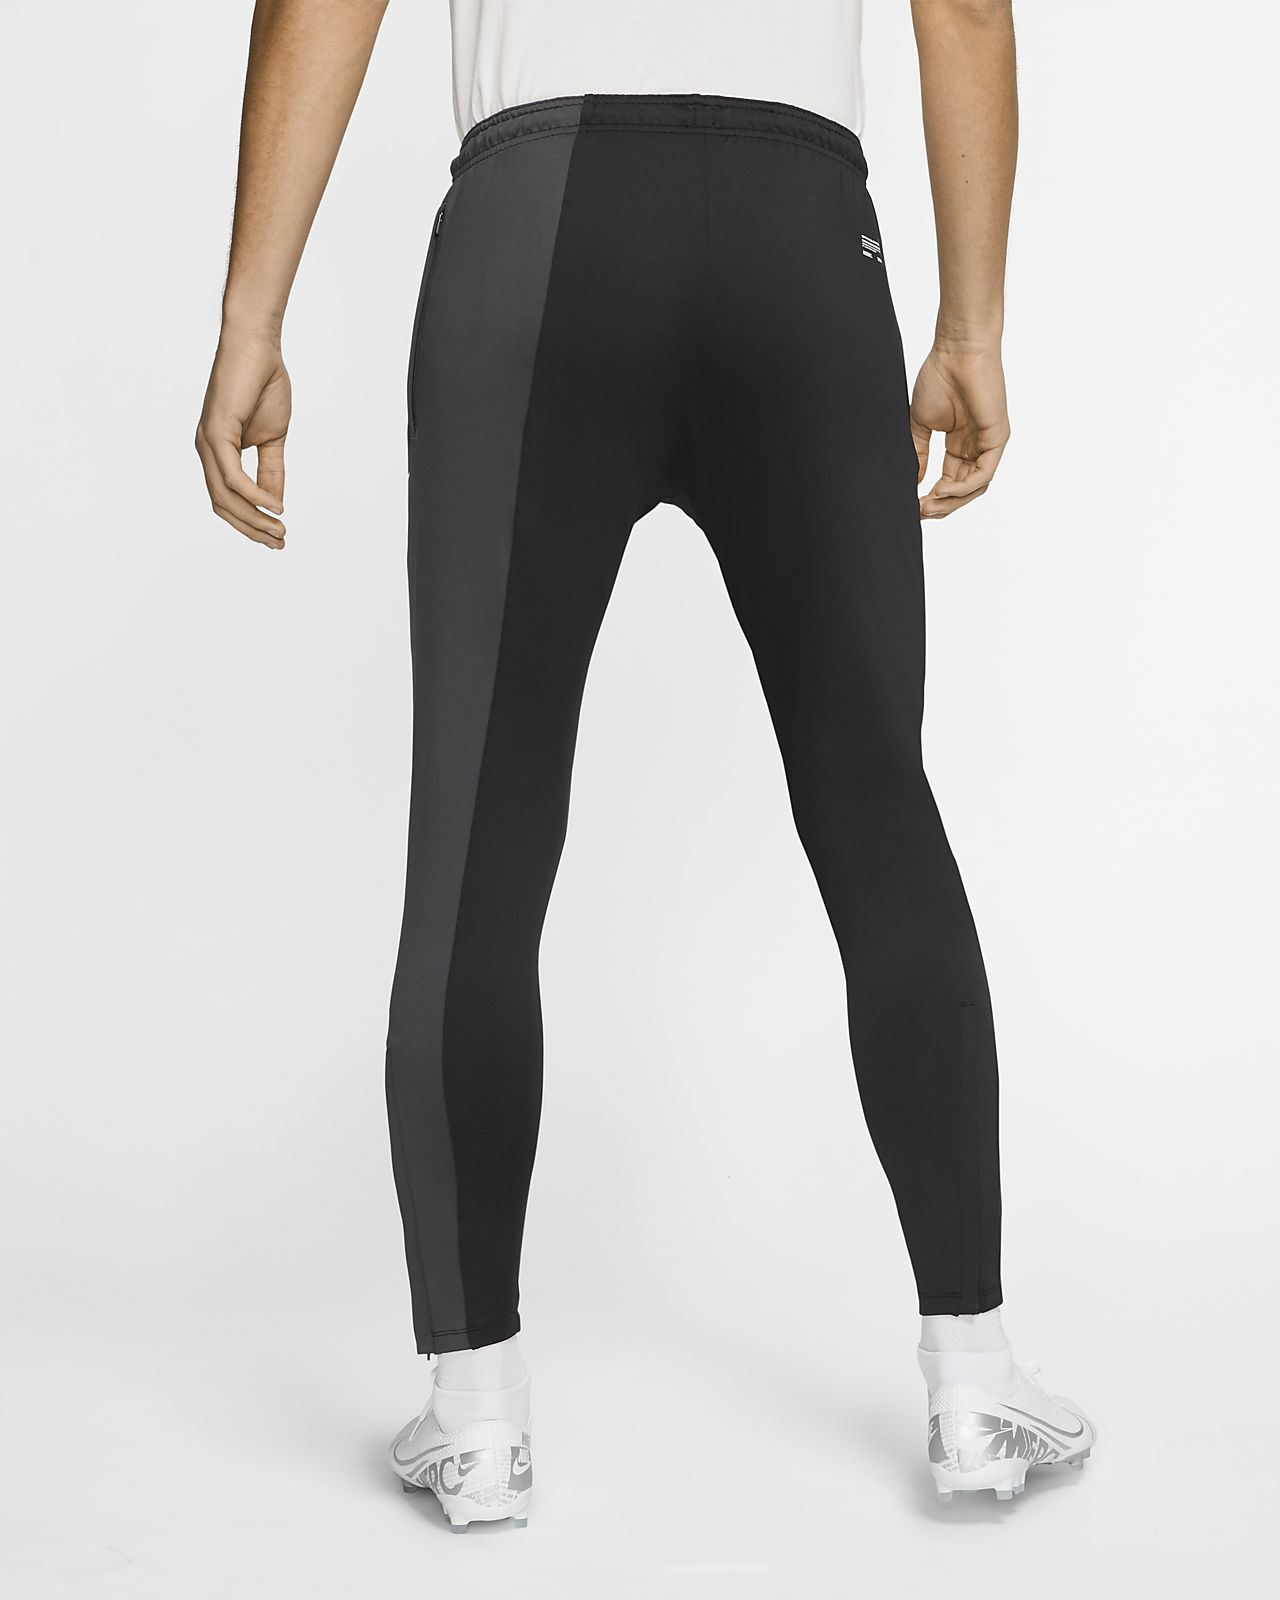 nike 3/4 pants mens soccer